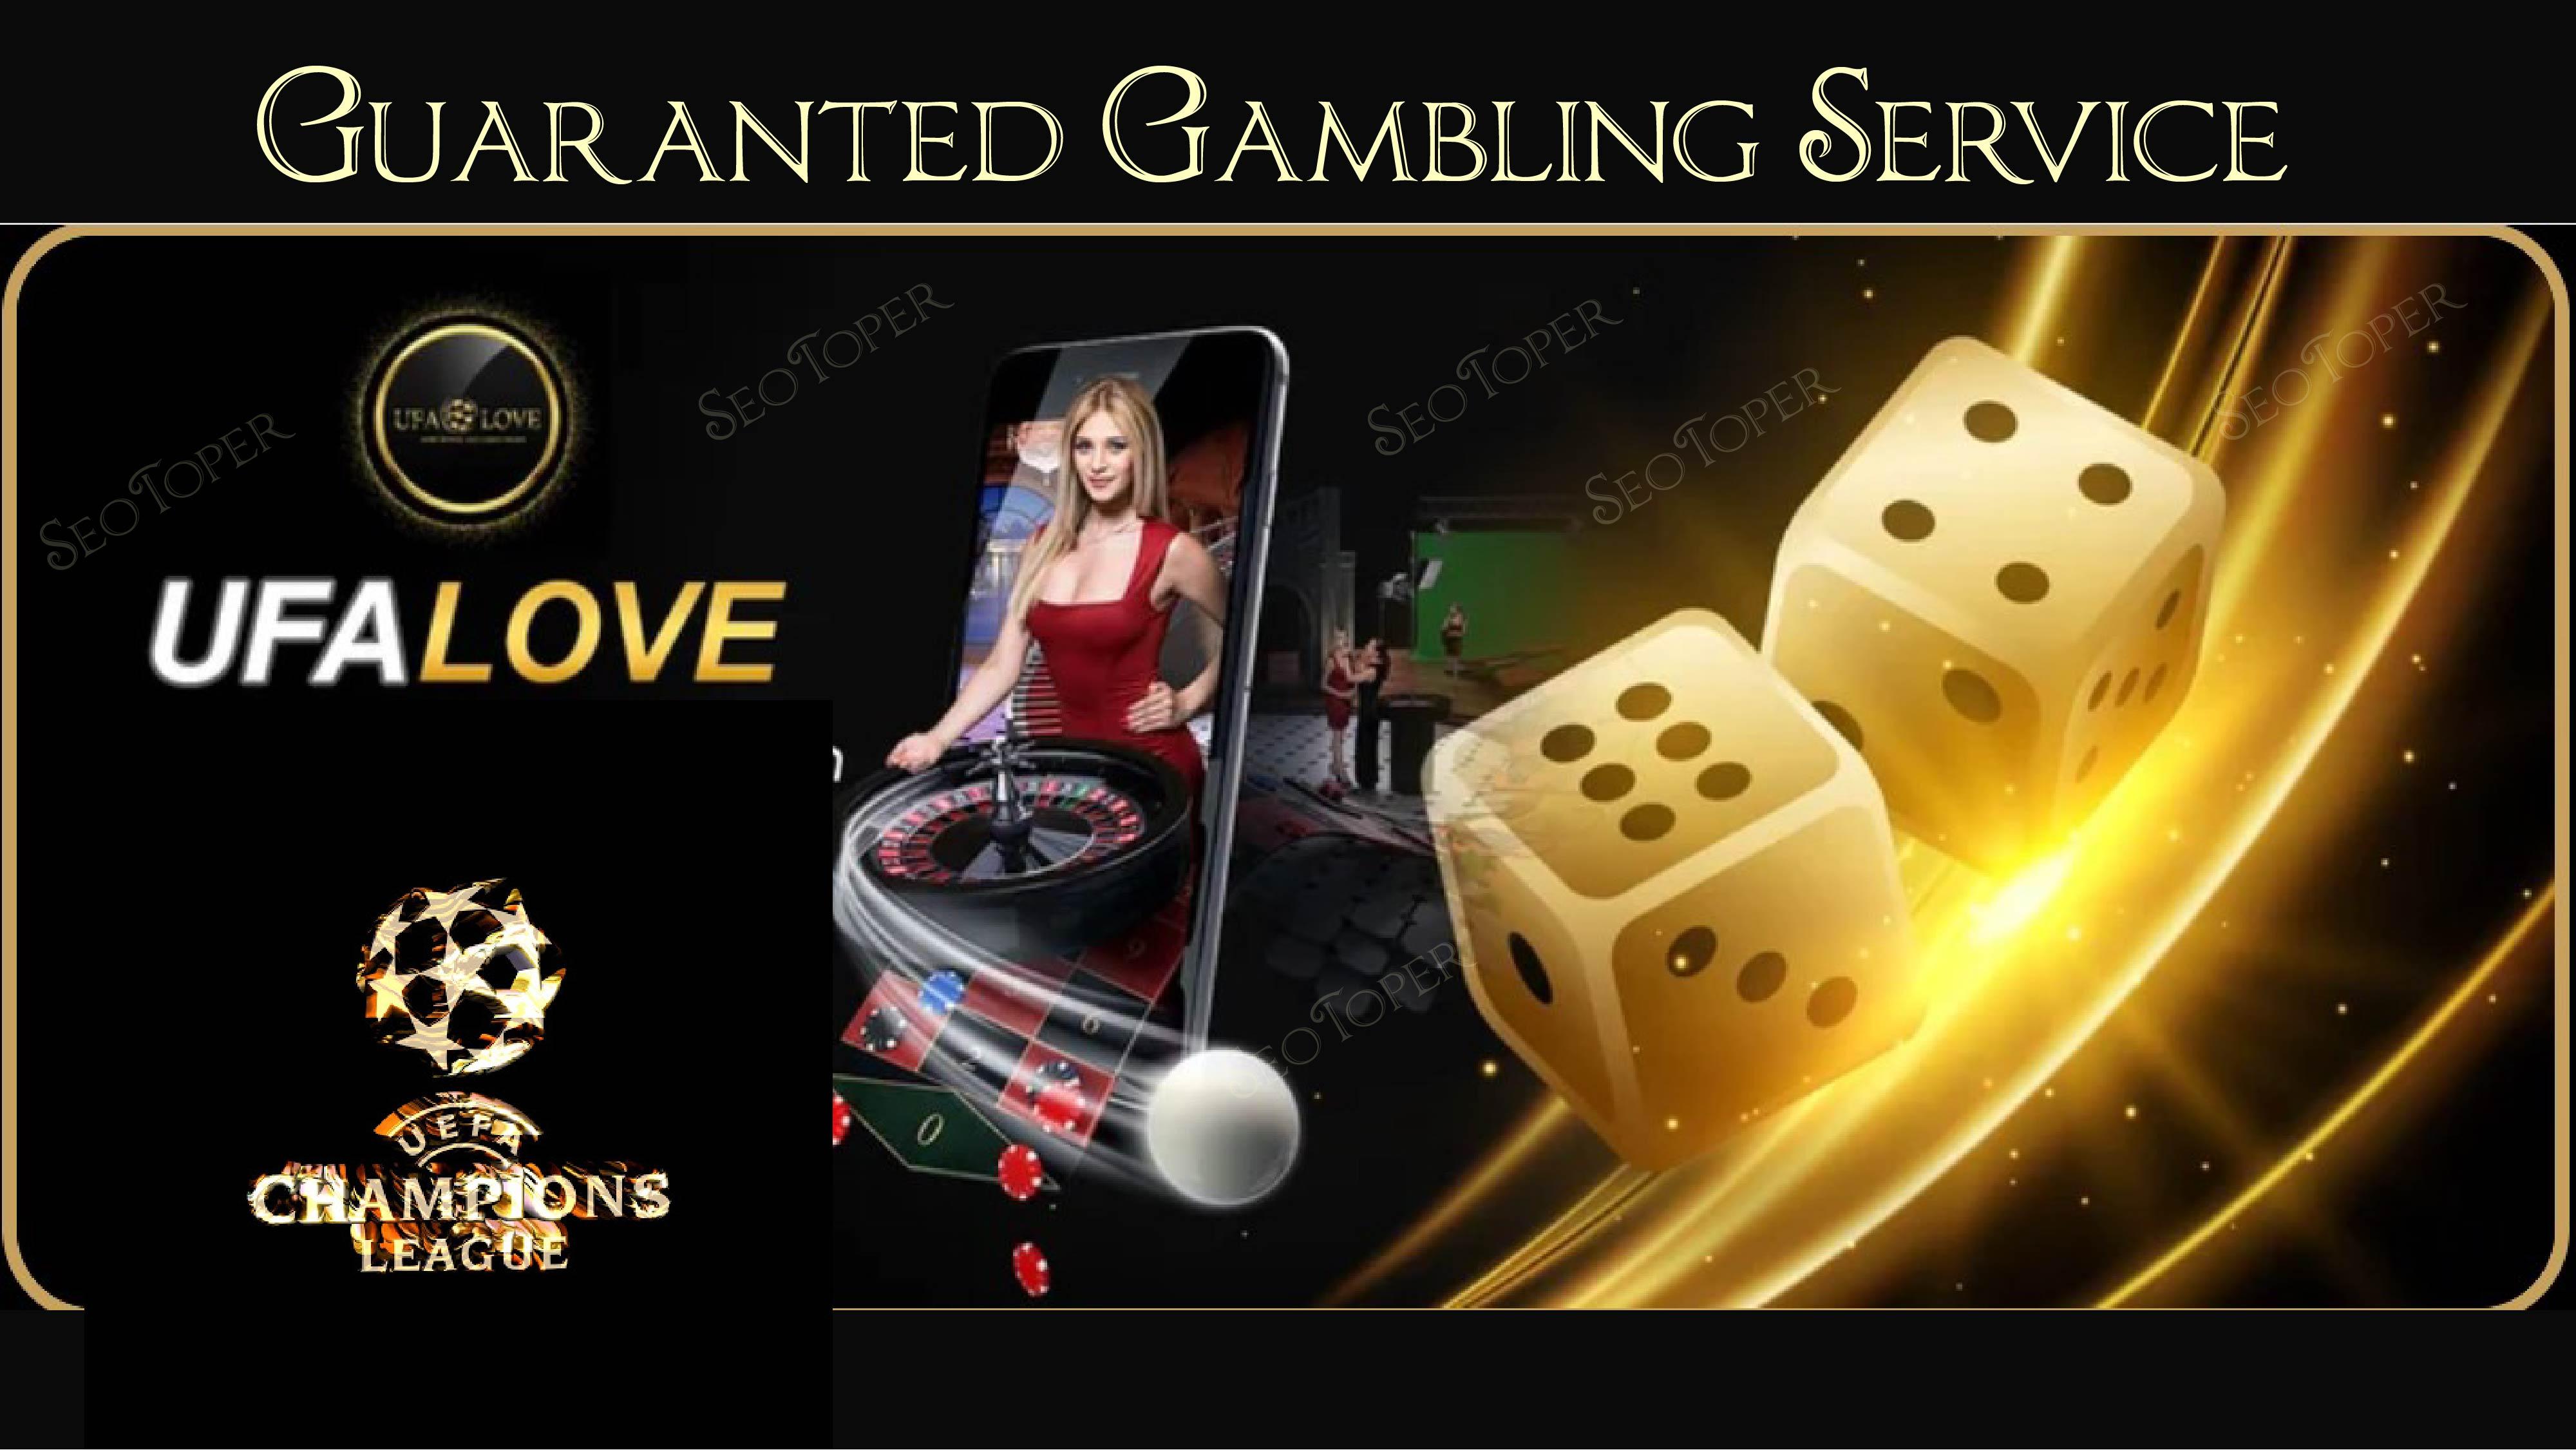 2 buy get 1 Package FREE Casino poker SEO Premium High PBN Quality backlink 4,500+ google ranking